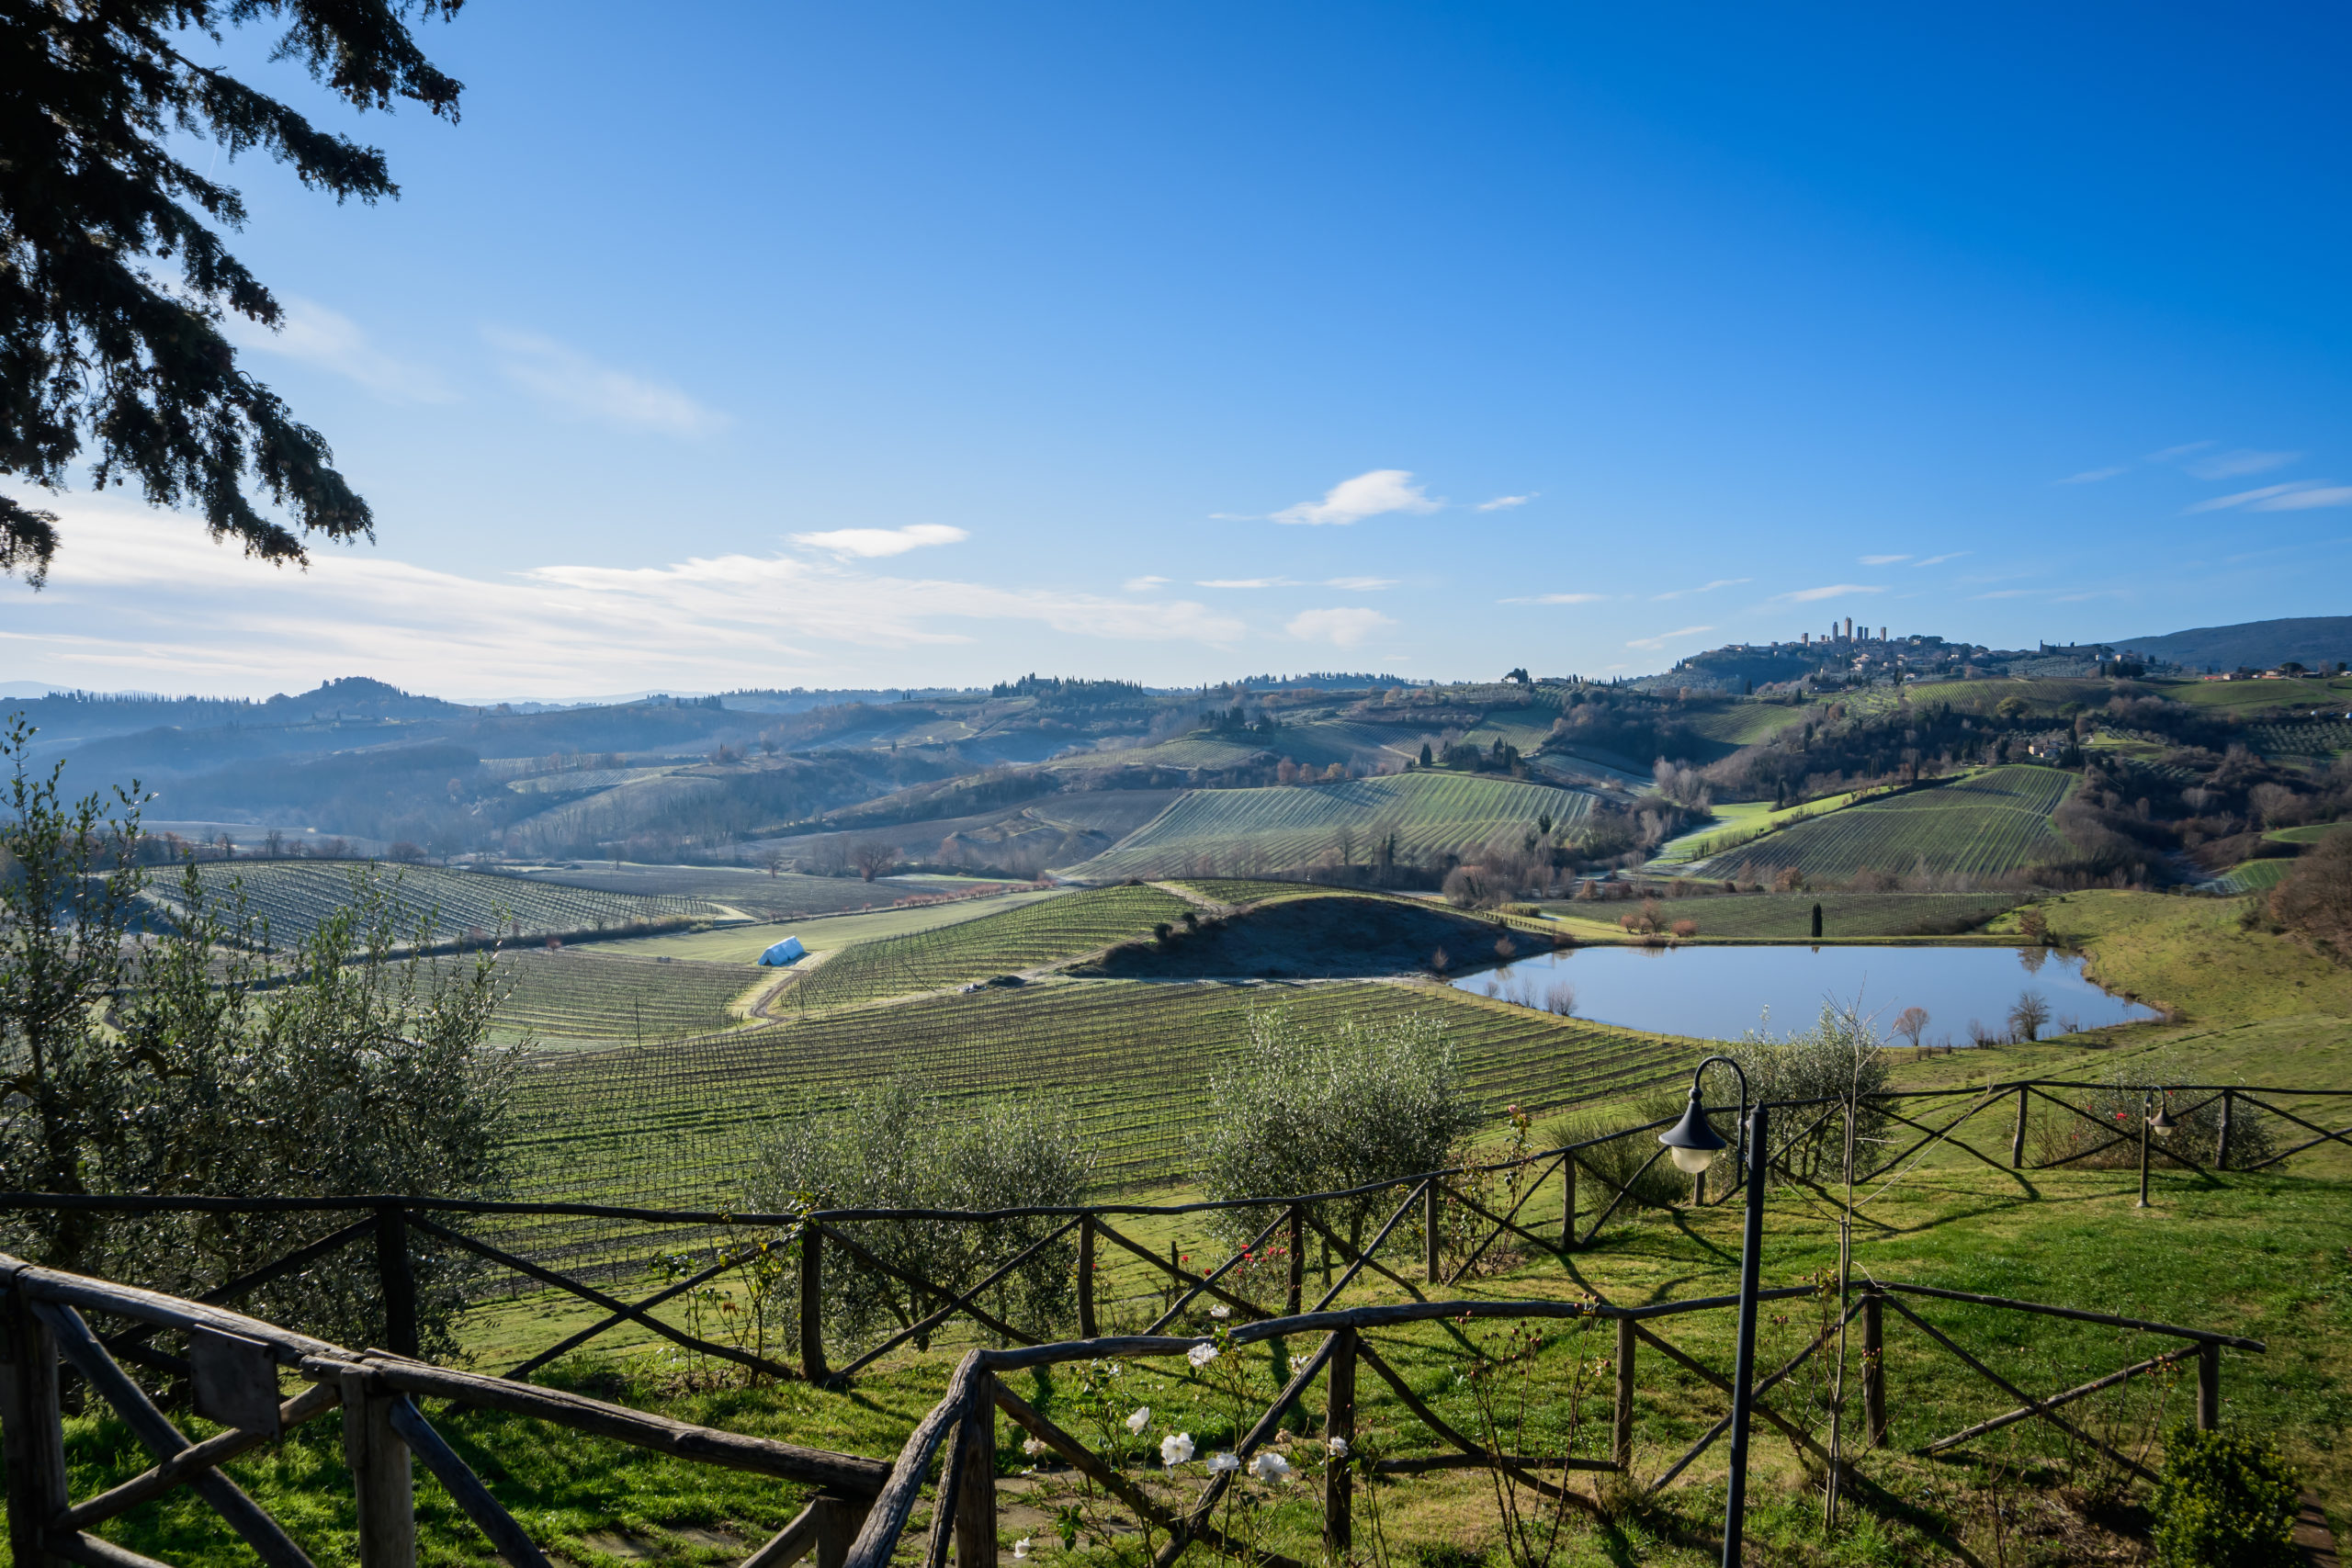 Vineyards of Tuscany, by John Monarch